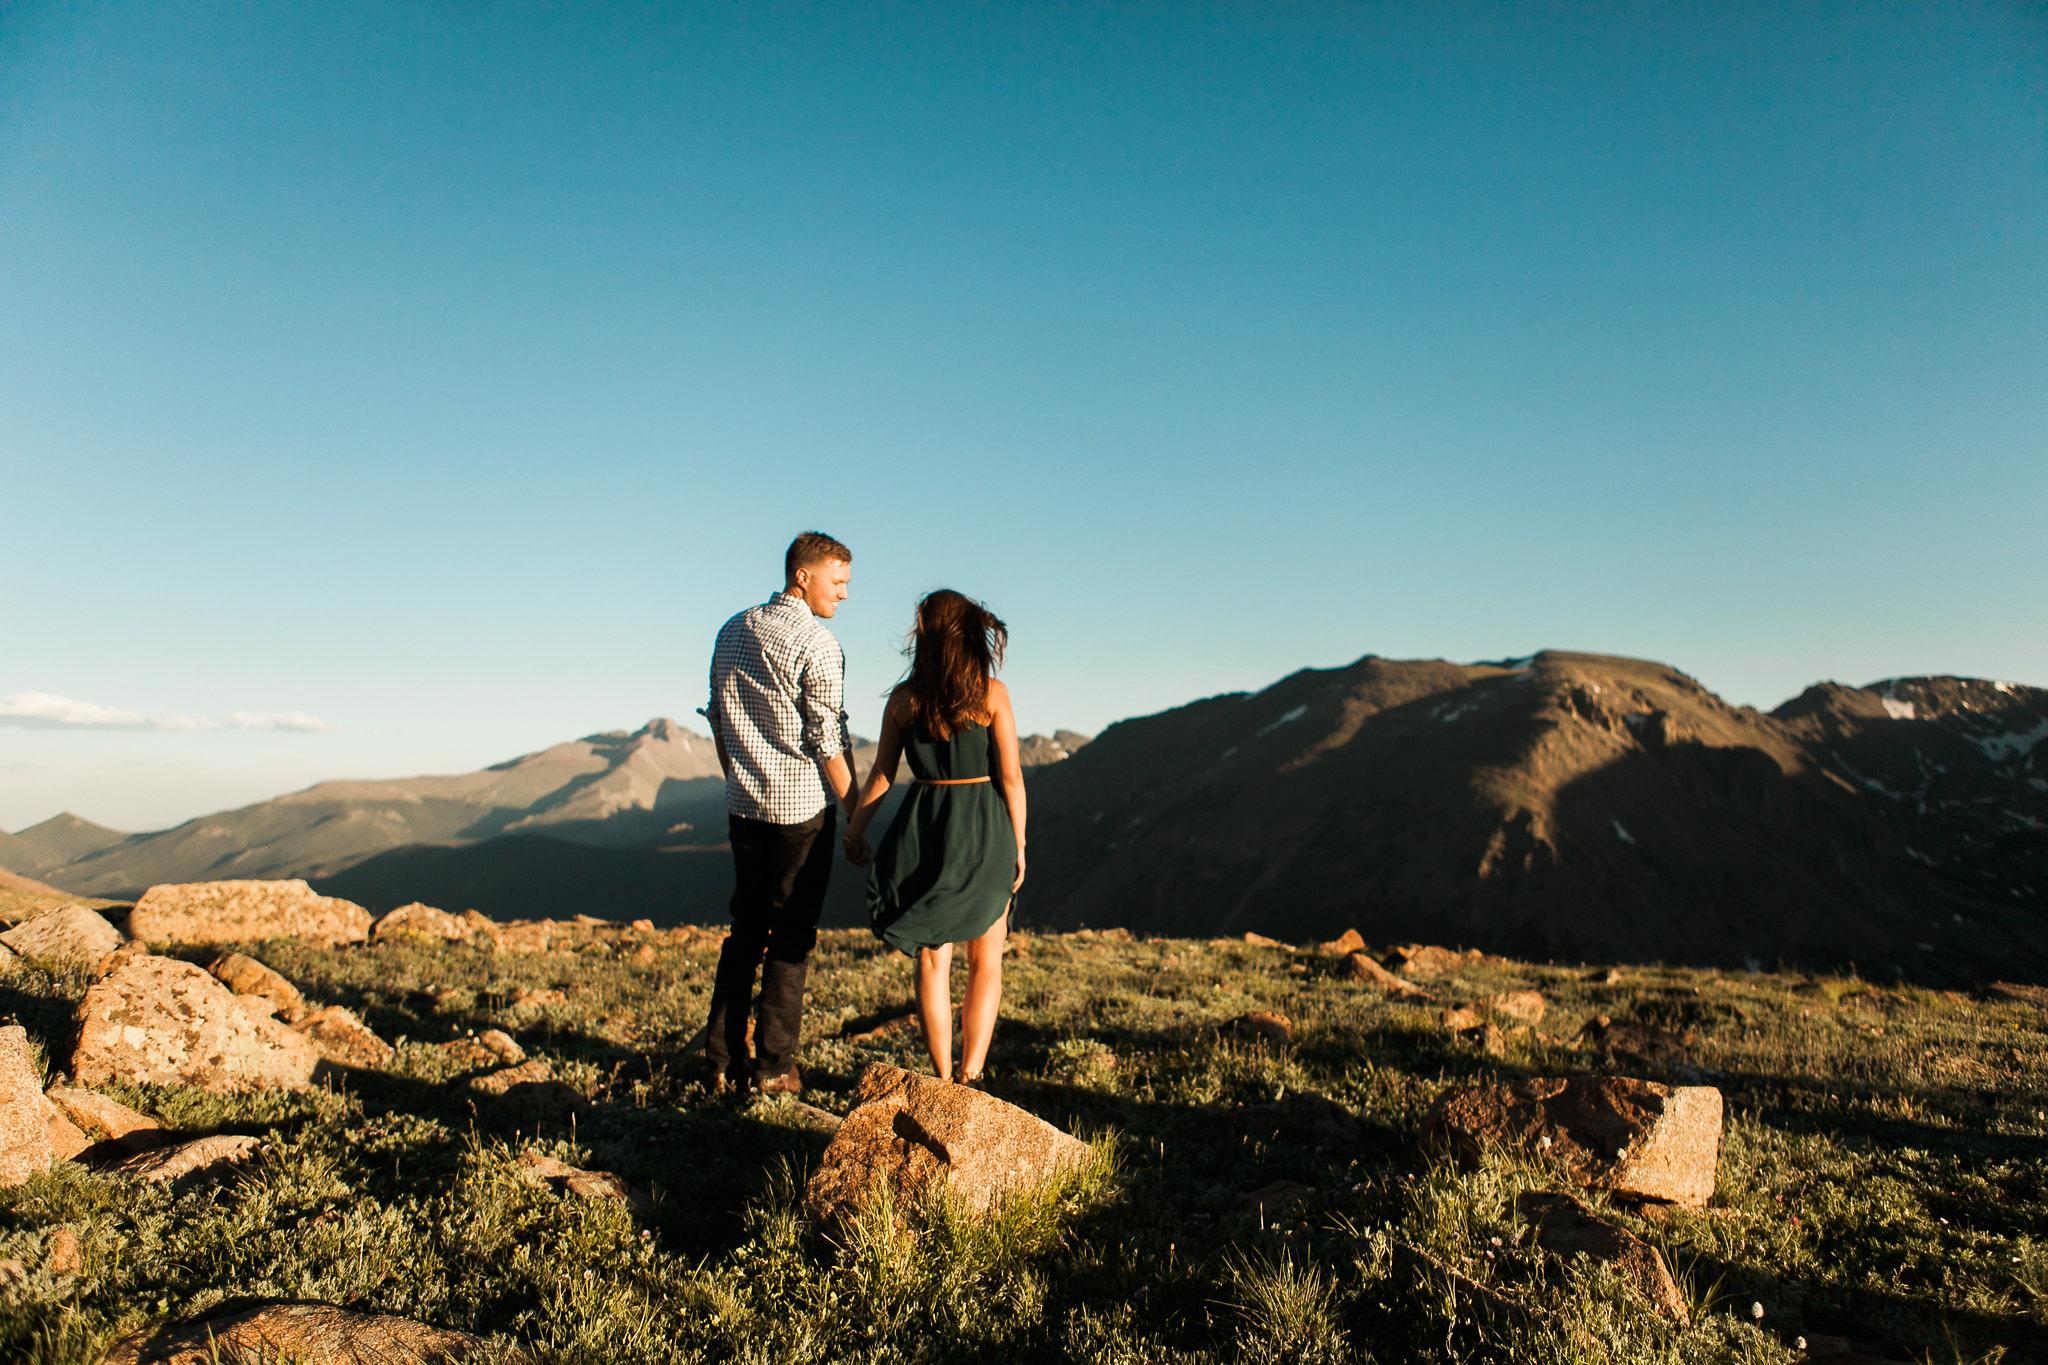 Rocky-Mountain-National-Park-engagement_028.jpg